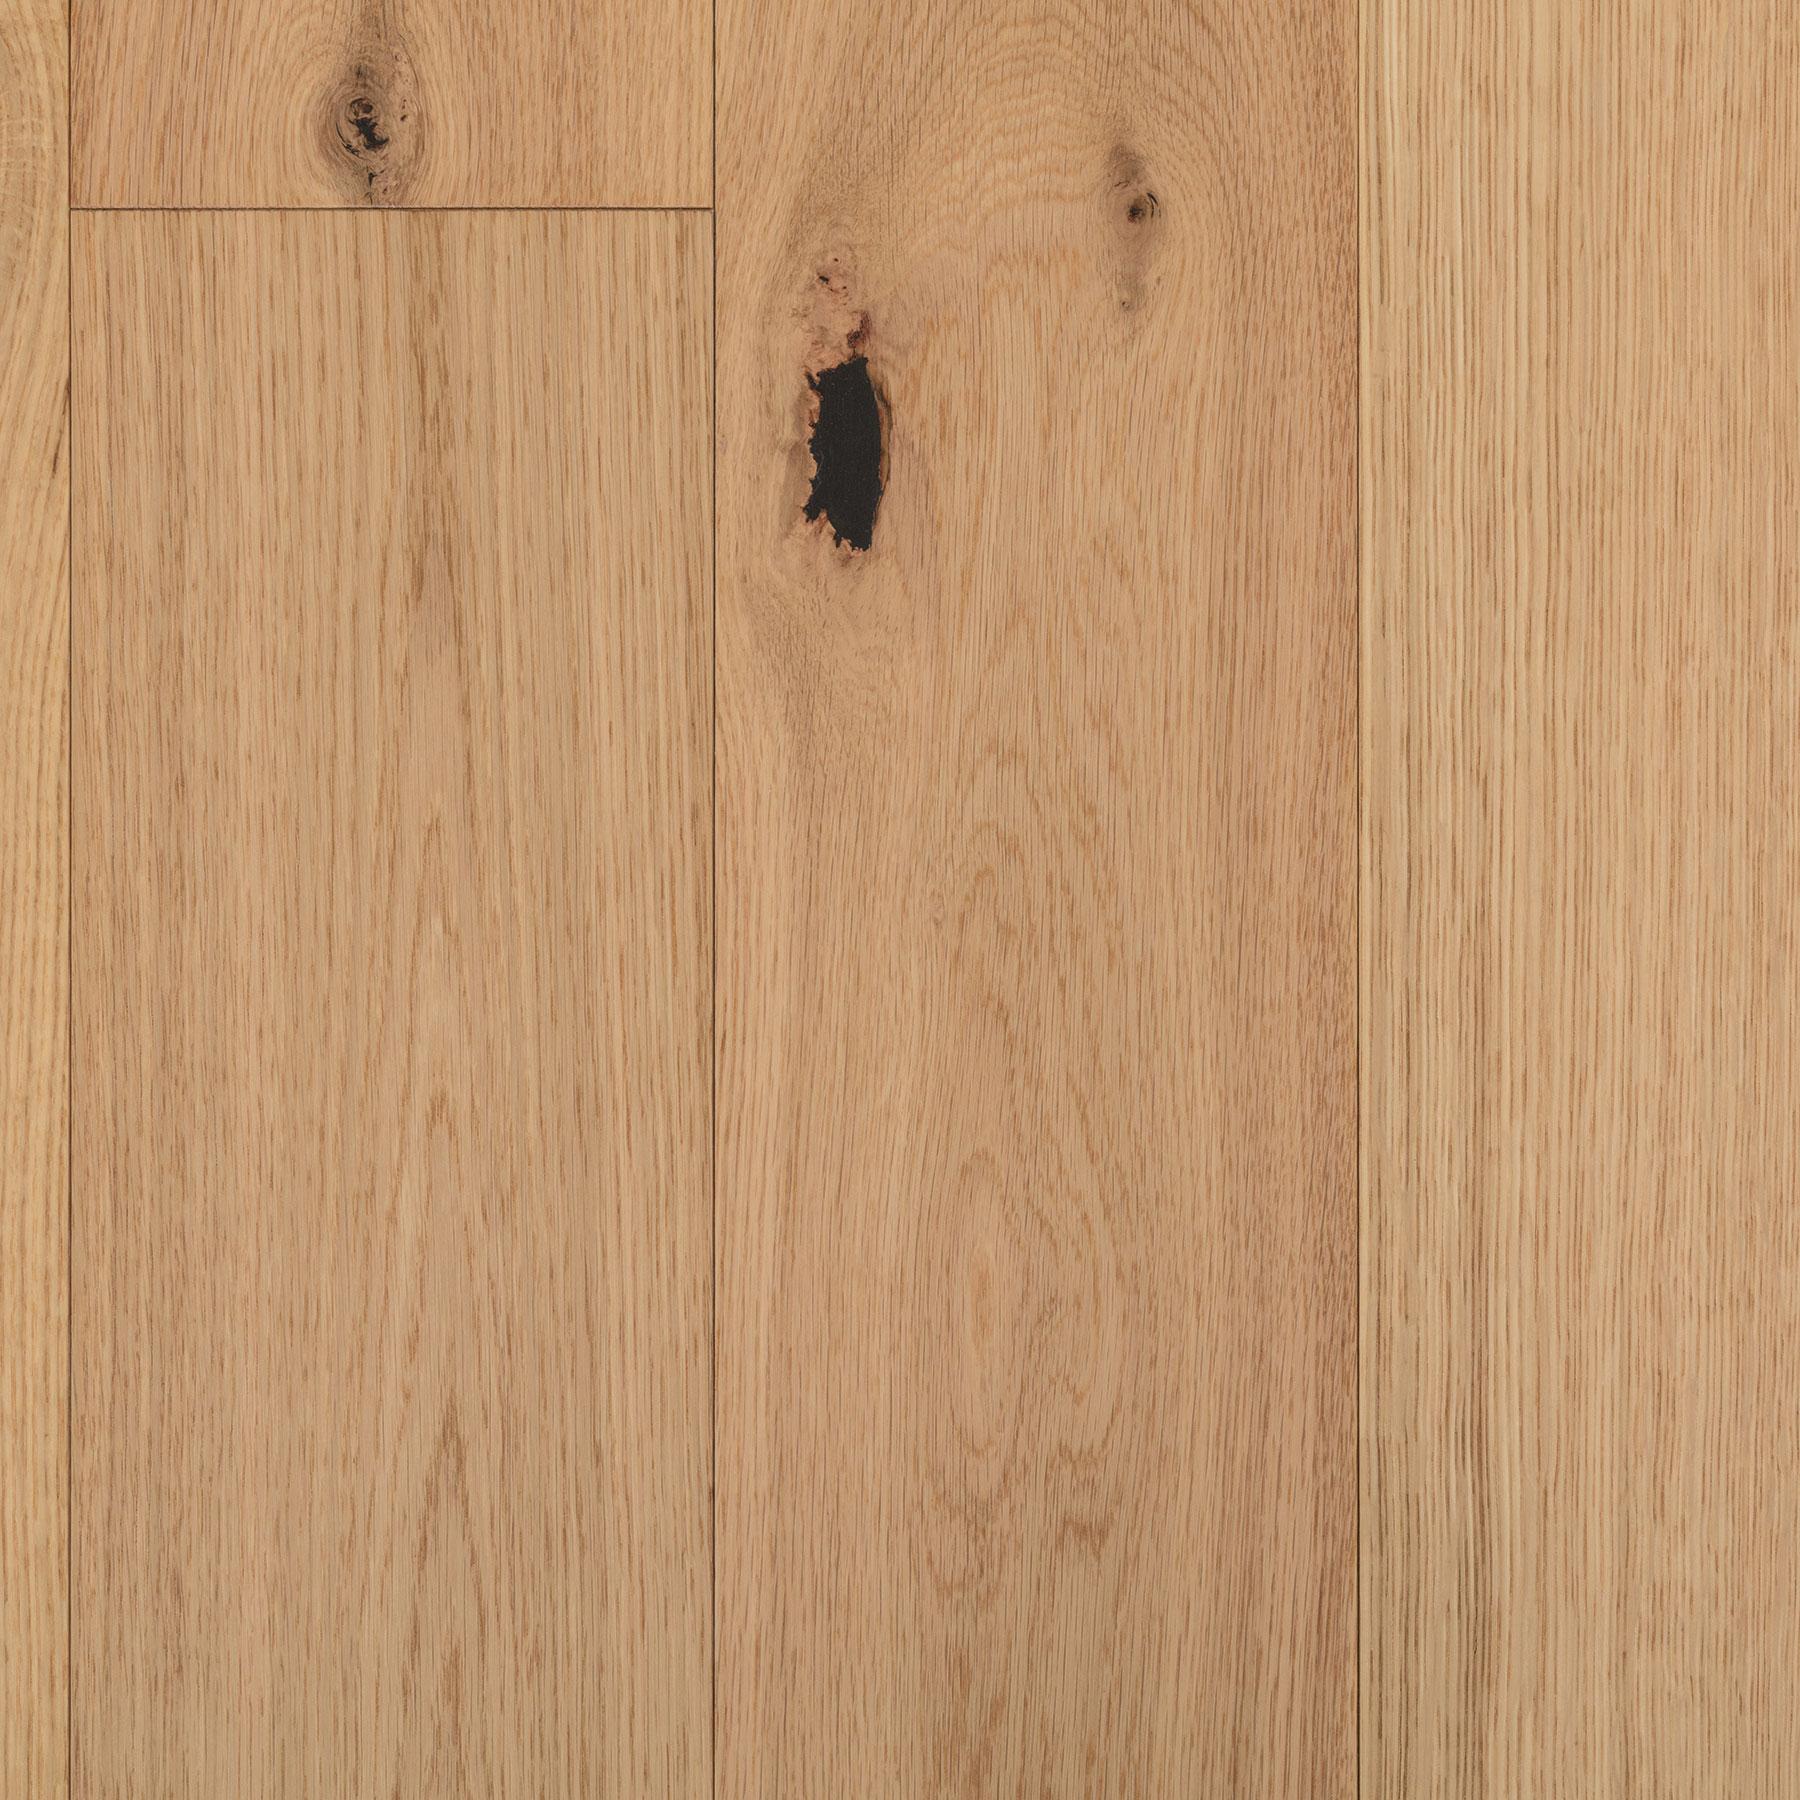 ch wood floors hardwood oak shf natural white somerset flooring westchester